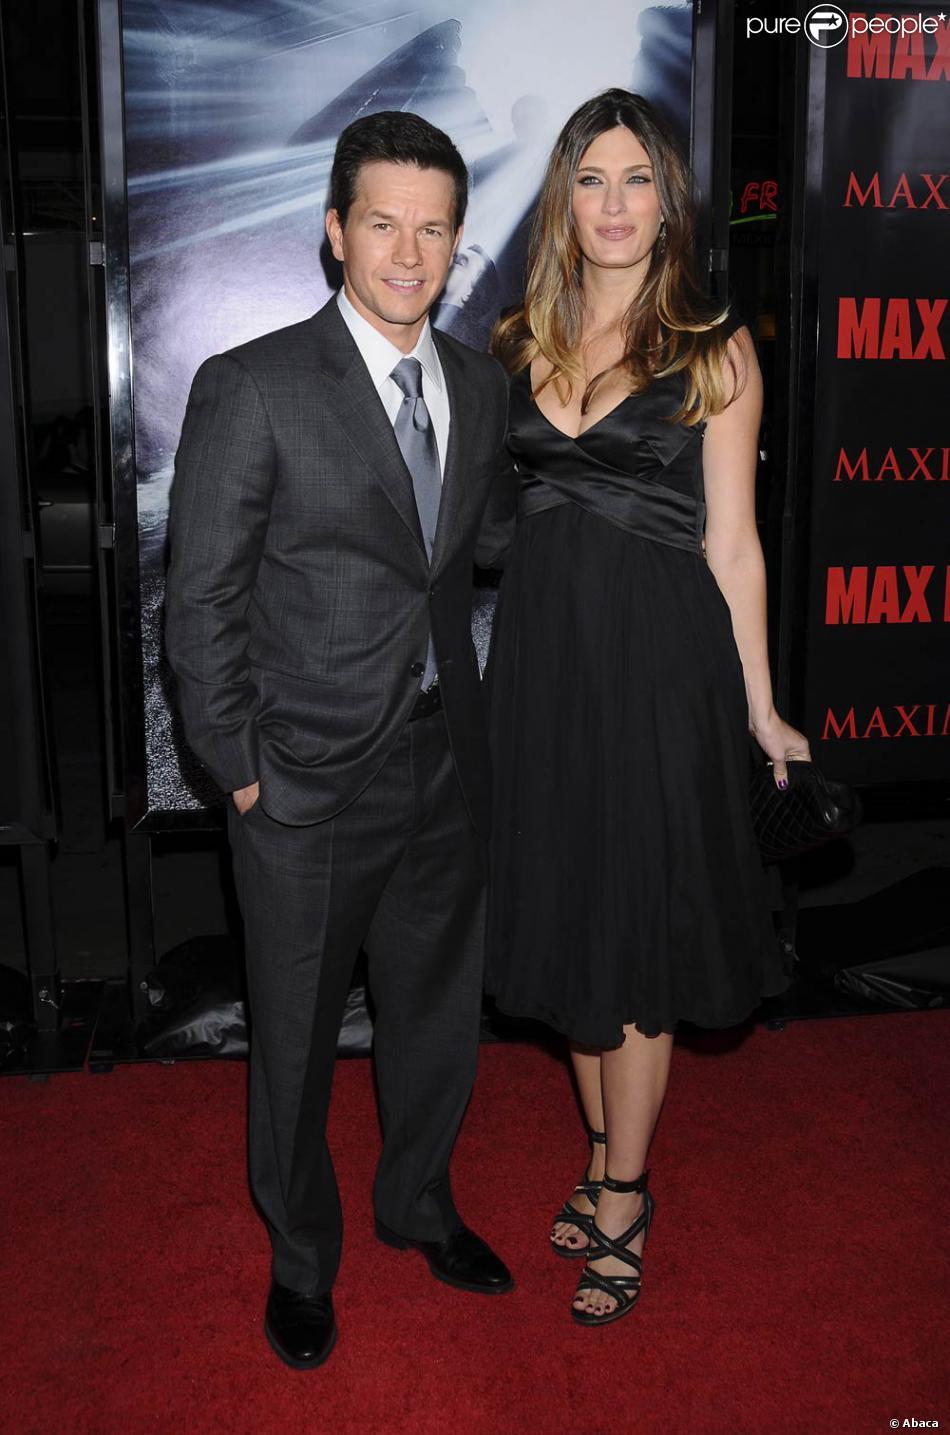 Mark Wahlberg et Rhea Durham : un couple joliment assorti ... Katie Holmes Divorce